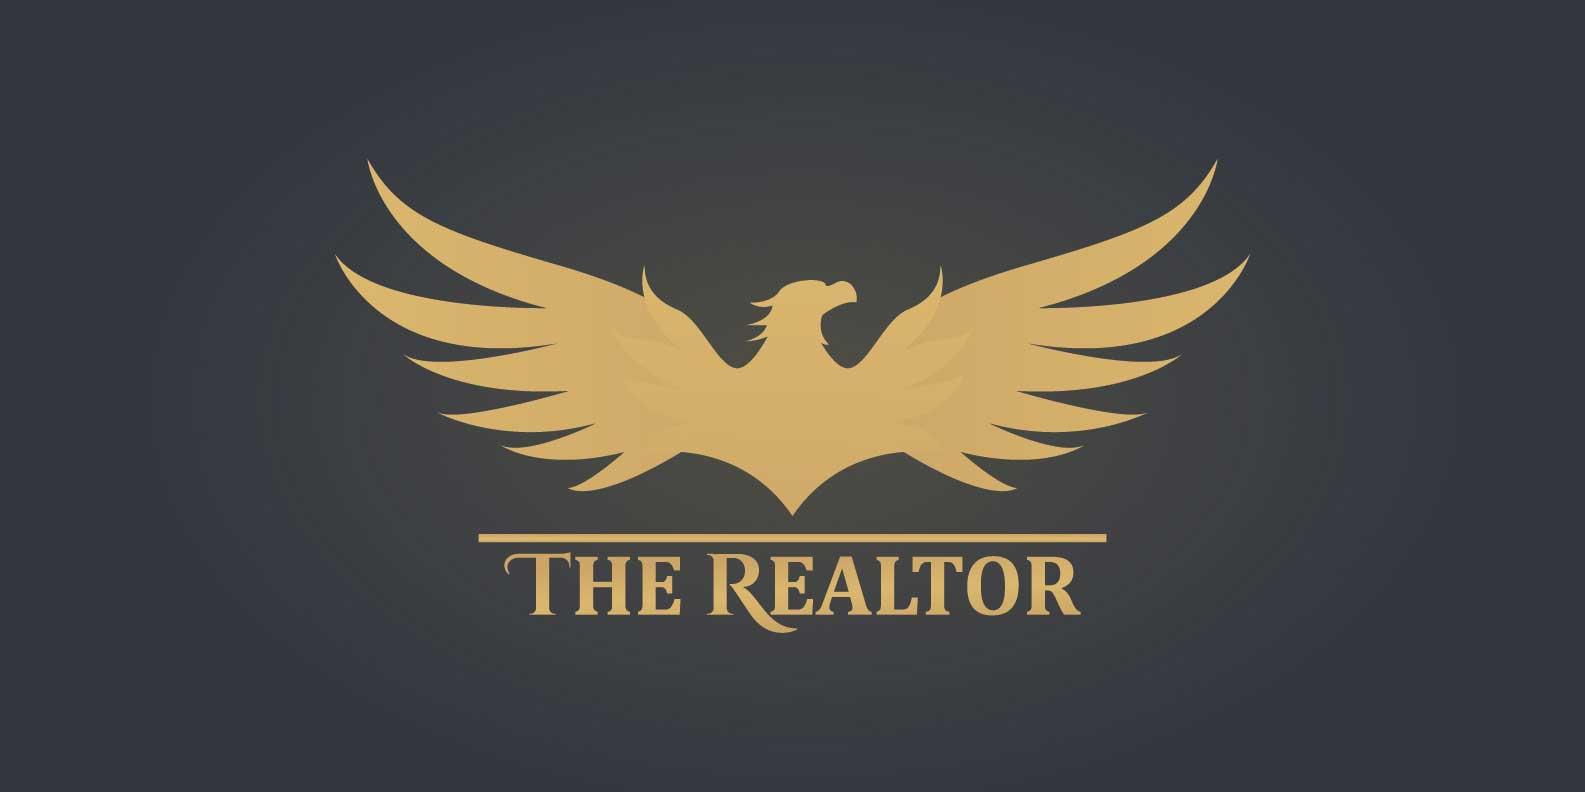 logo design service for The Realtor